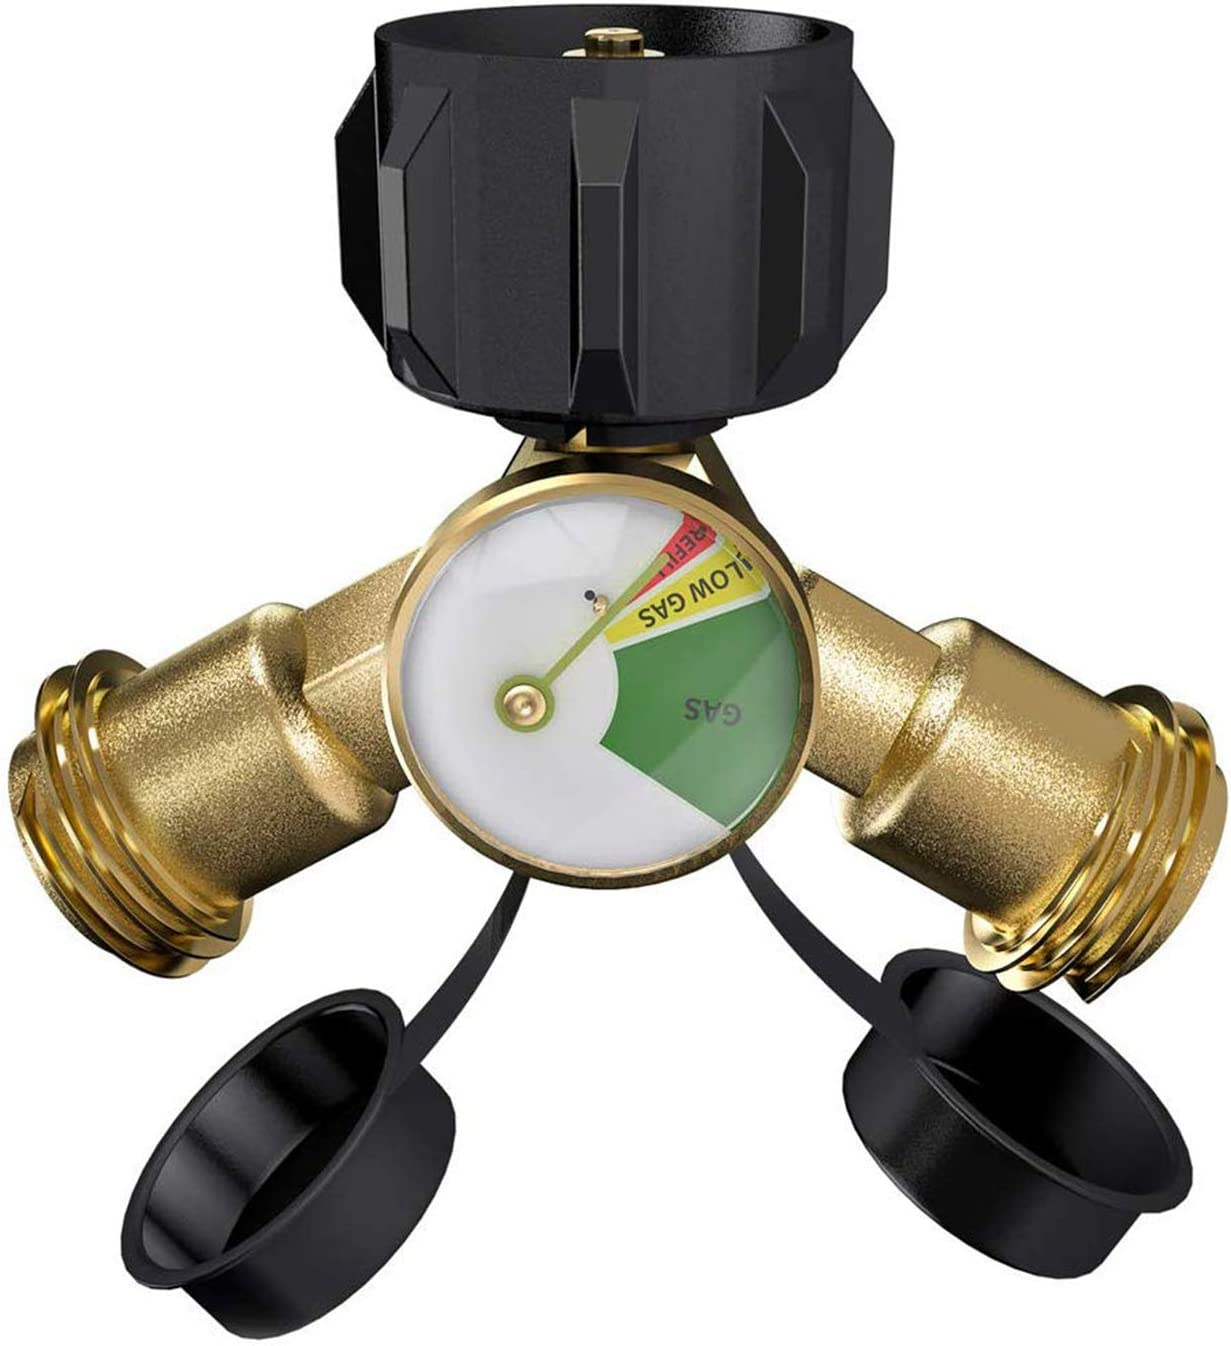 SHINESTAR Propane Y Splitter Tee Adapter with Propane Tank Gauge Level Indicator Leak Detector